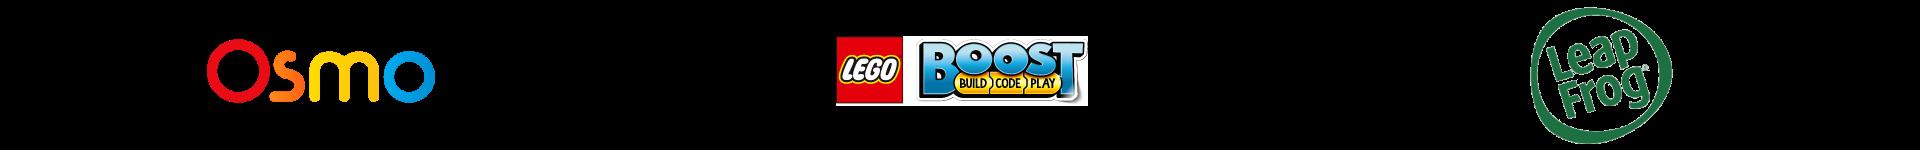 competitors-logo.png